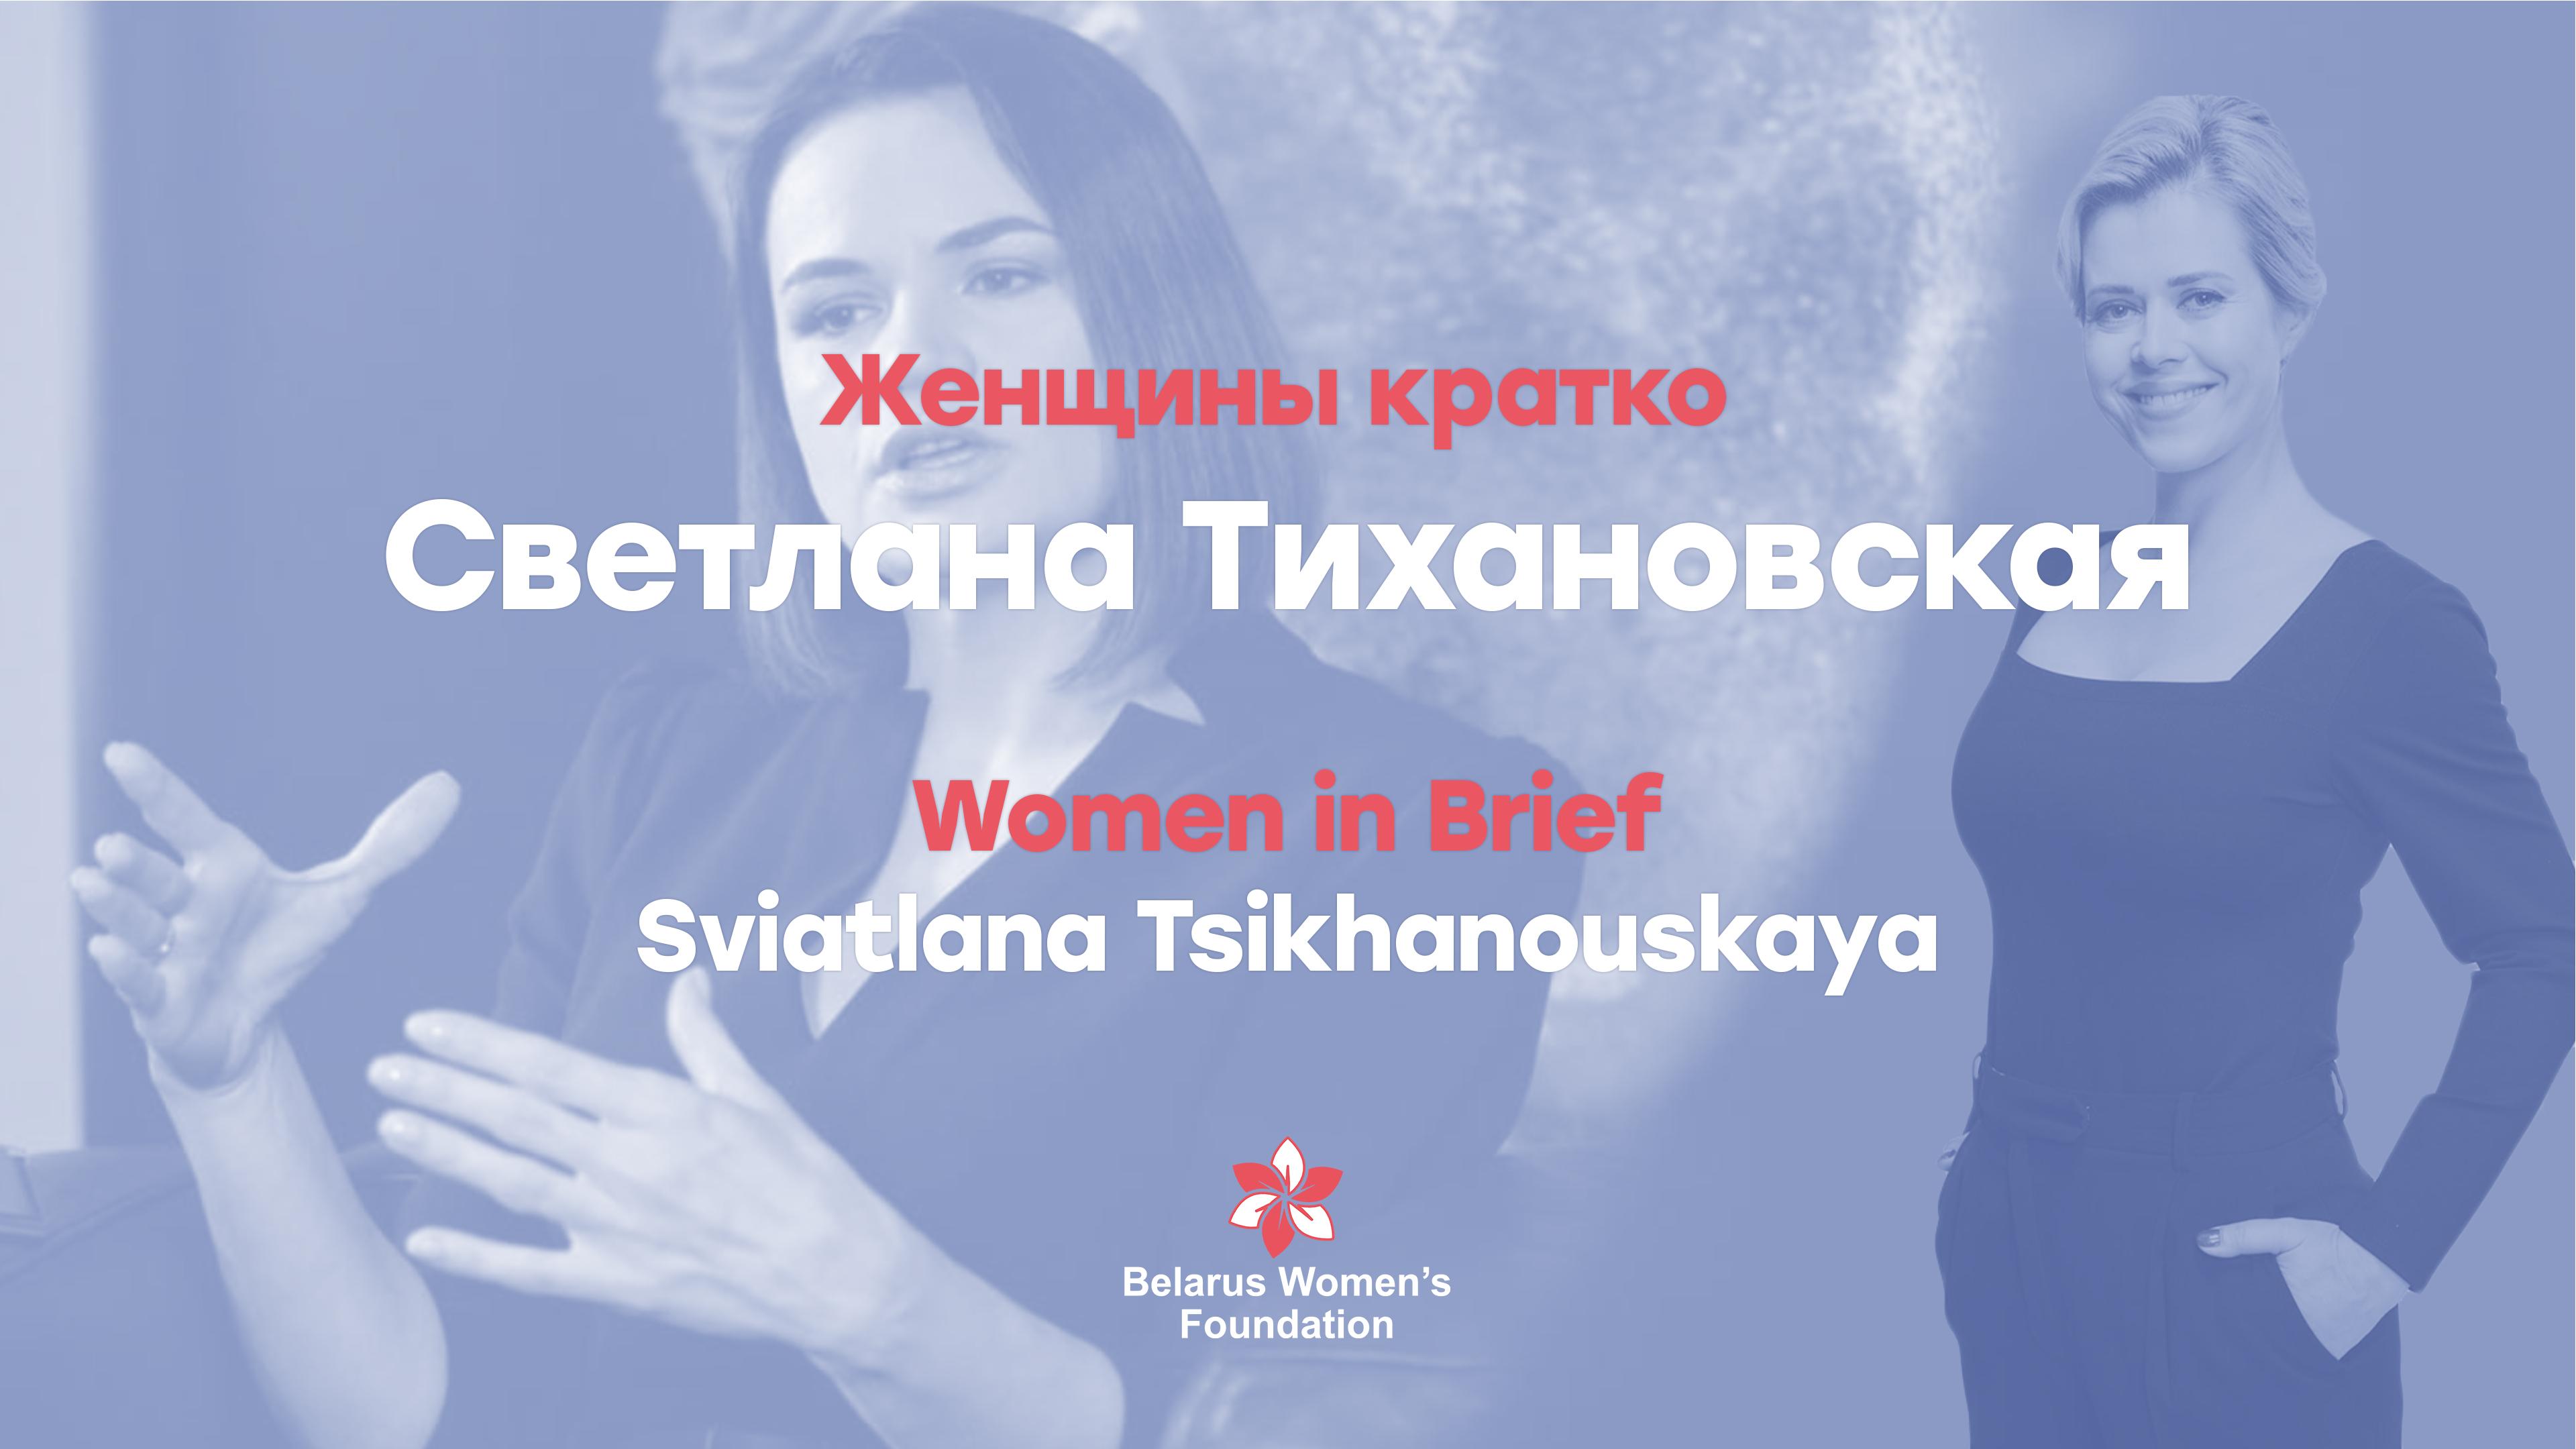 Women in brief | Sviatlana Tsikhanouskaya